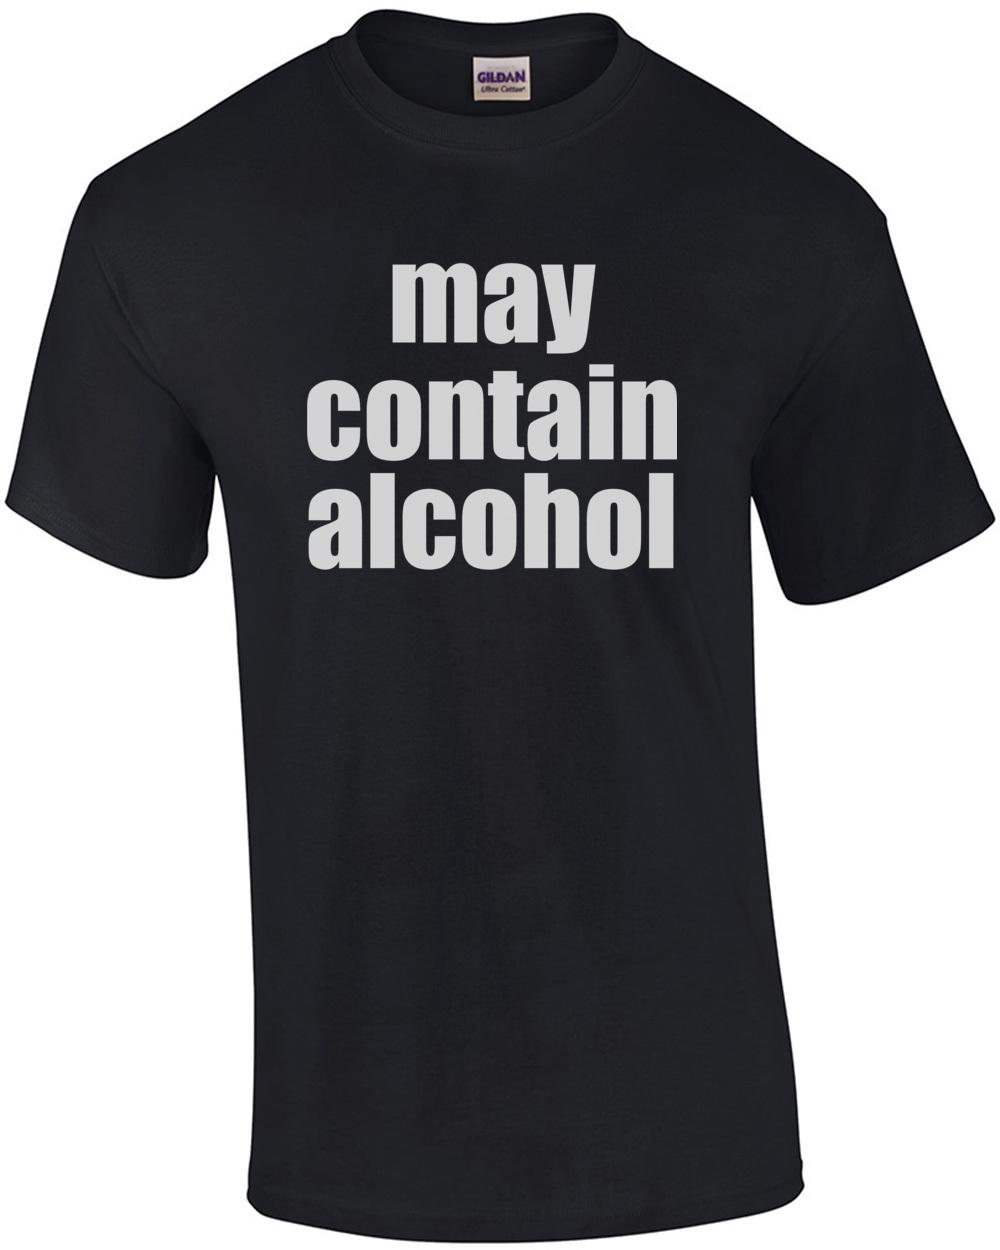 f3b26468073e9 may-contain-alcohol--funny-drinking-tshirt-mens-regular-black.jpg